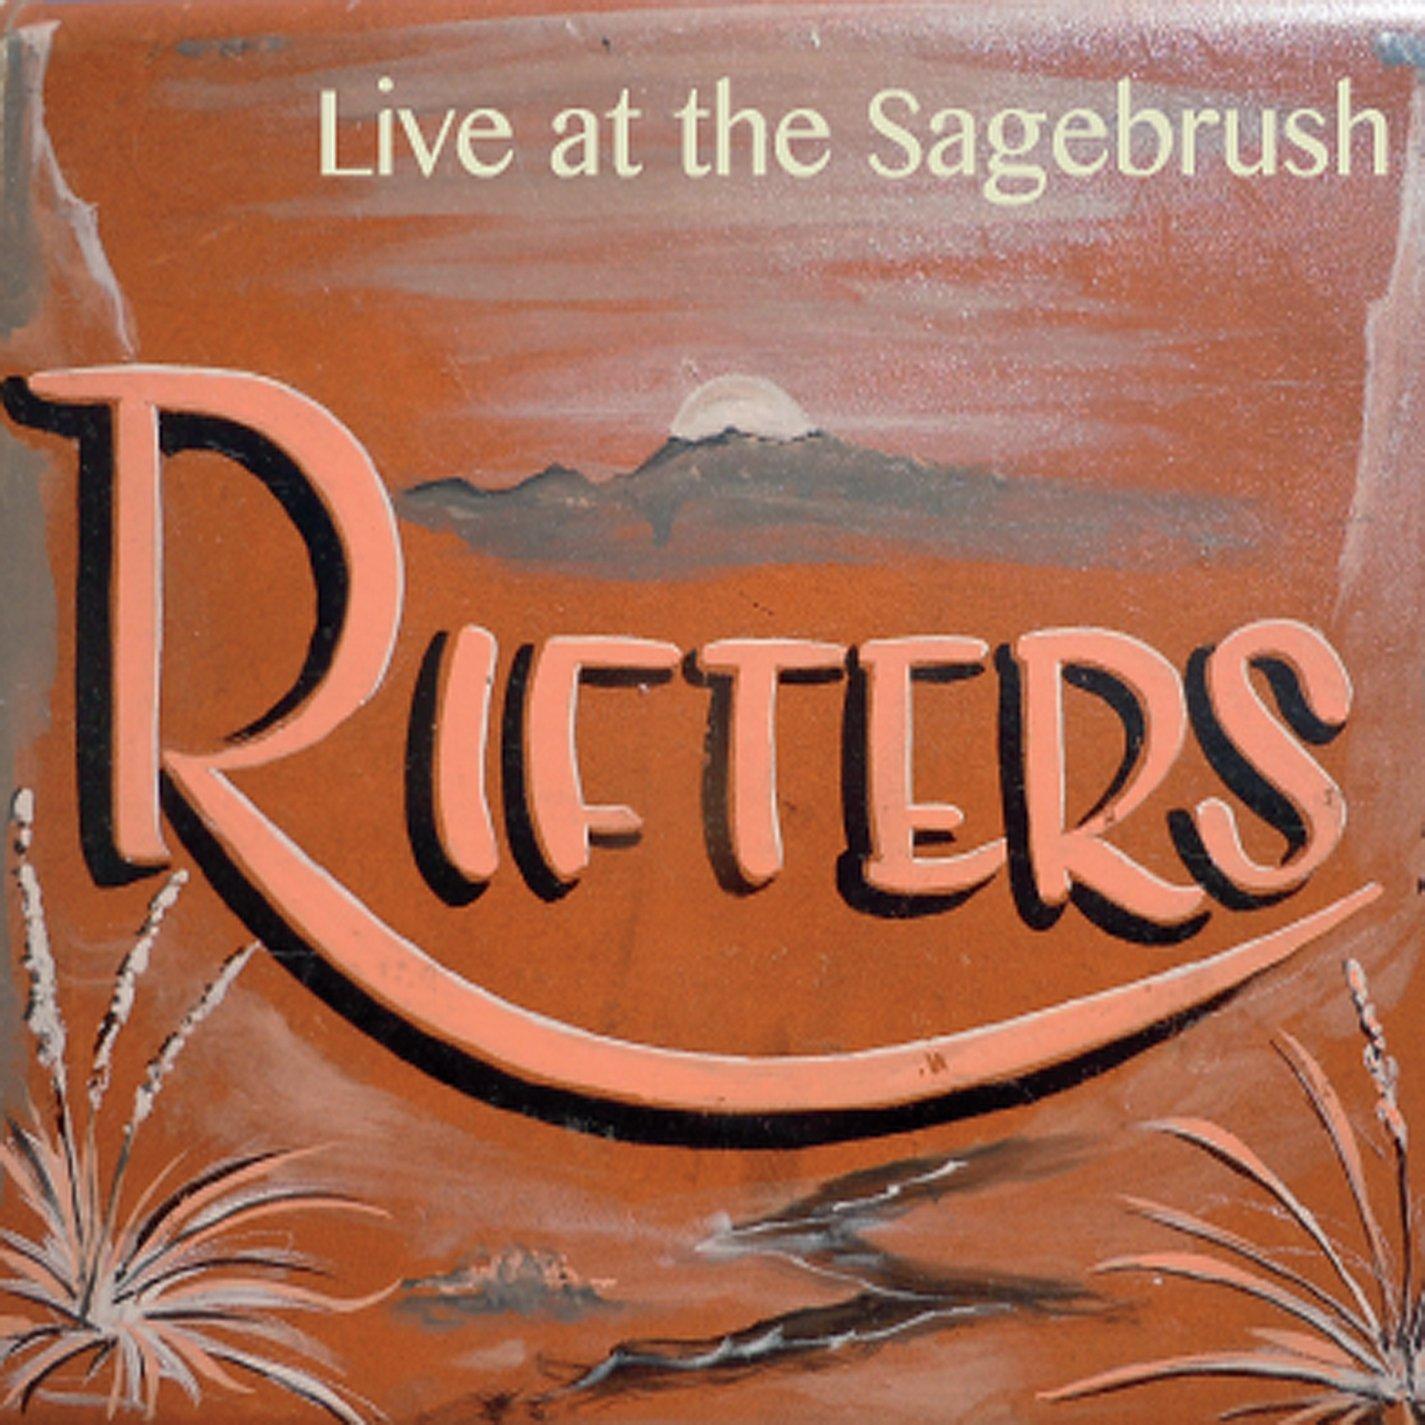 Live at the Sagebrush